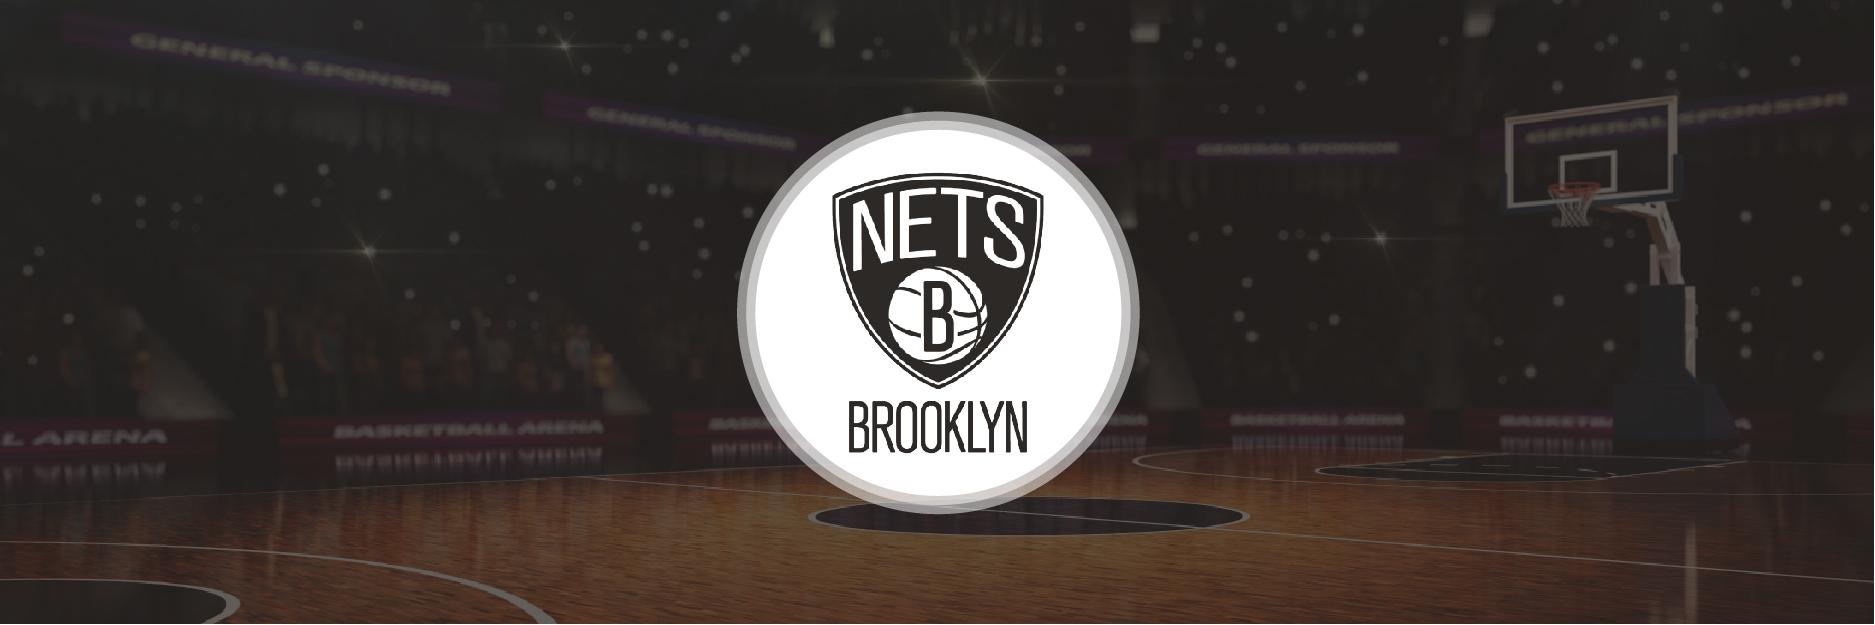 NBA Brooklyn Nets 2020 Season Analysis